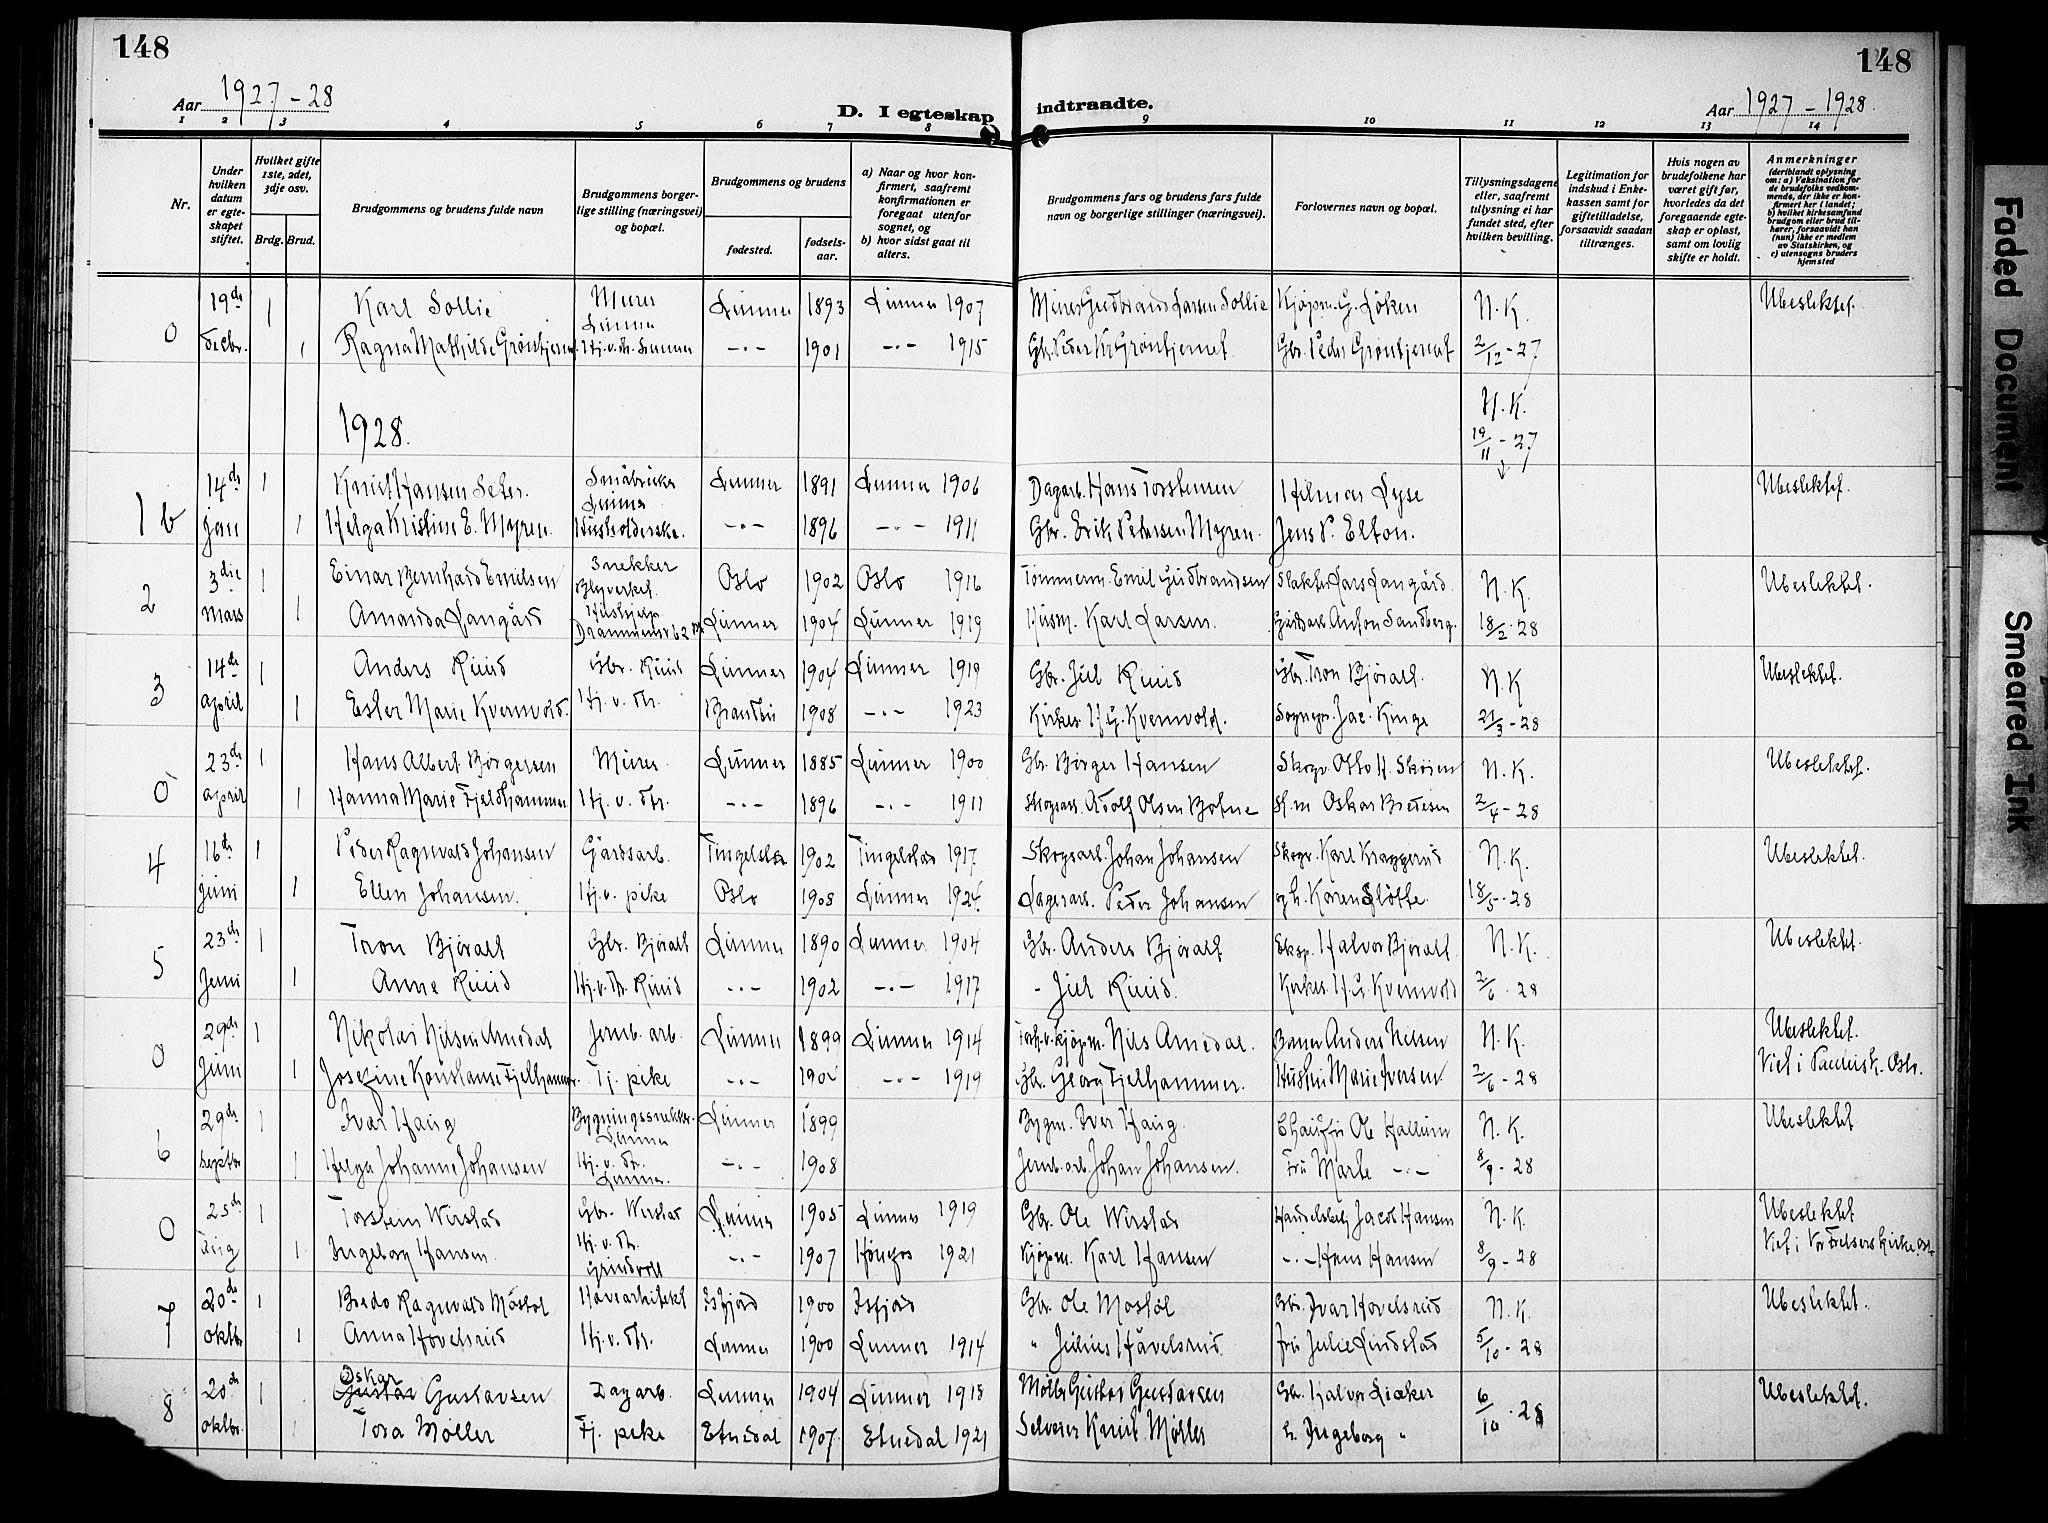 SAH, Lunner prestekontor, H/Ha/Hab/L0002: Klokkerbok nr. 2, 1923-1933, s. 148